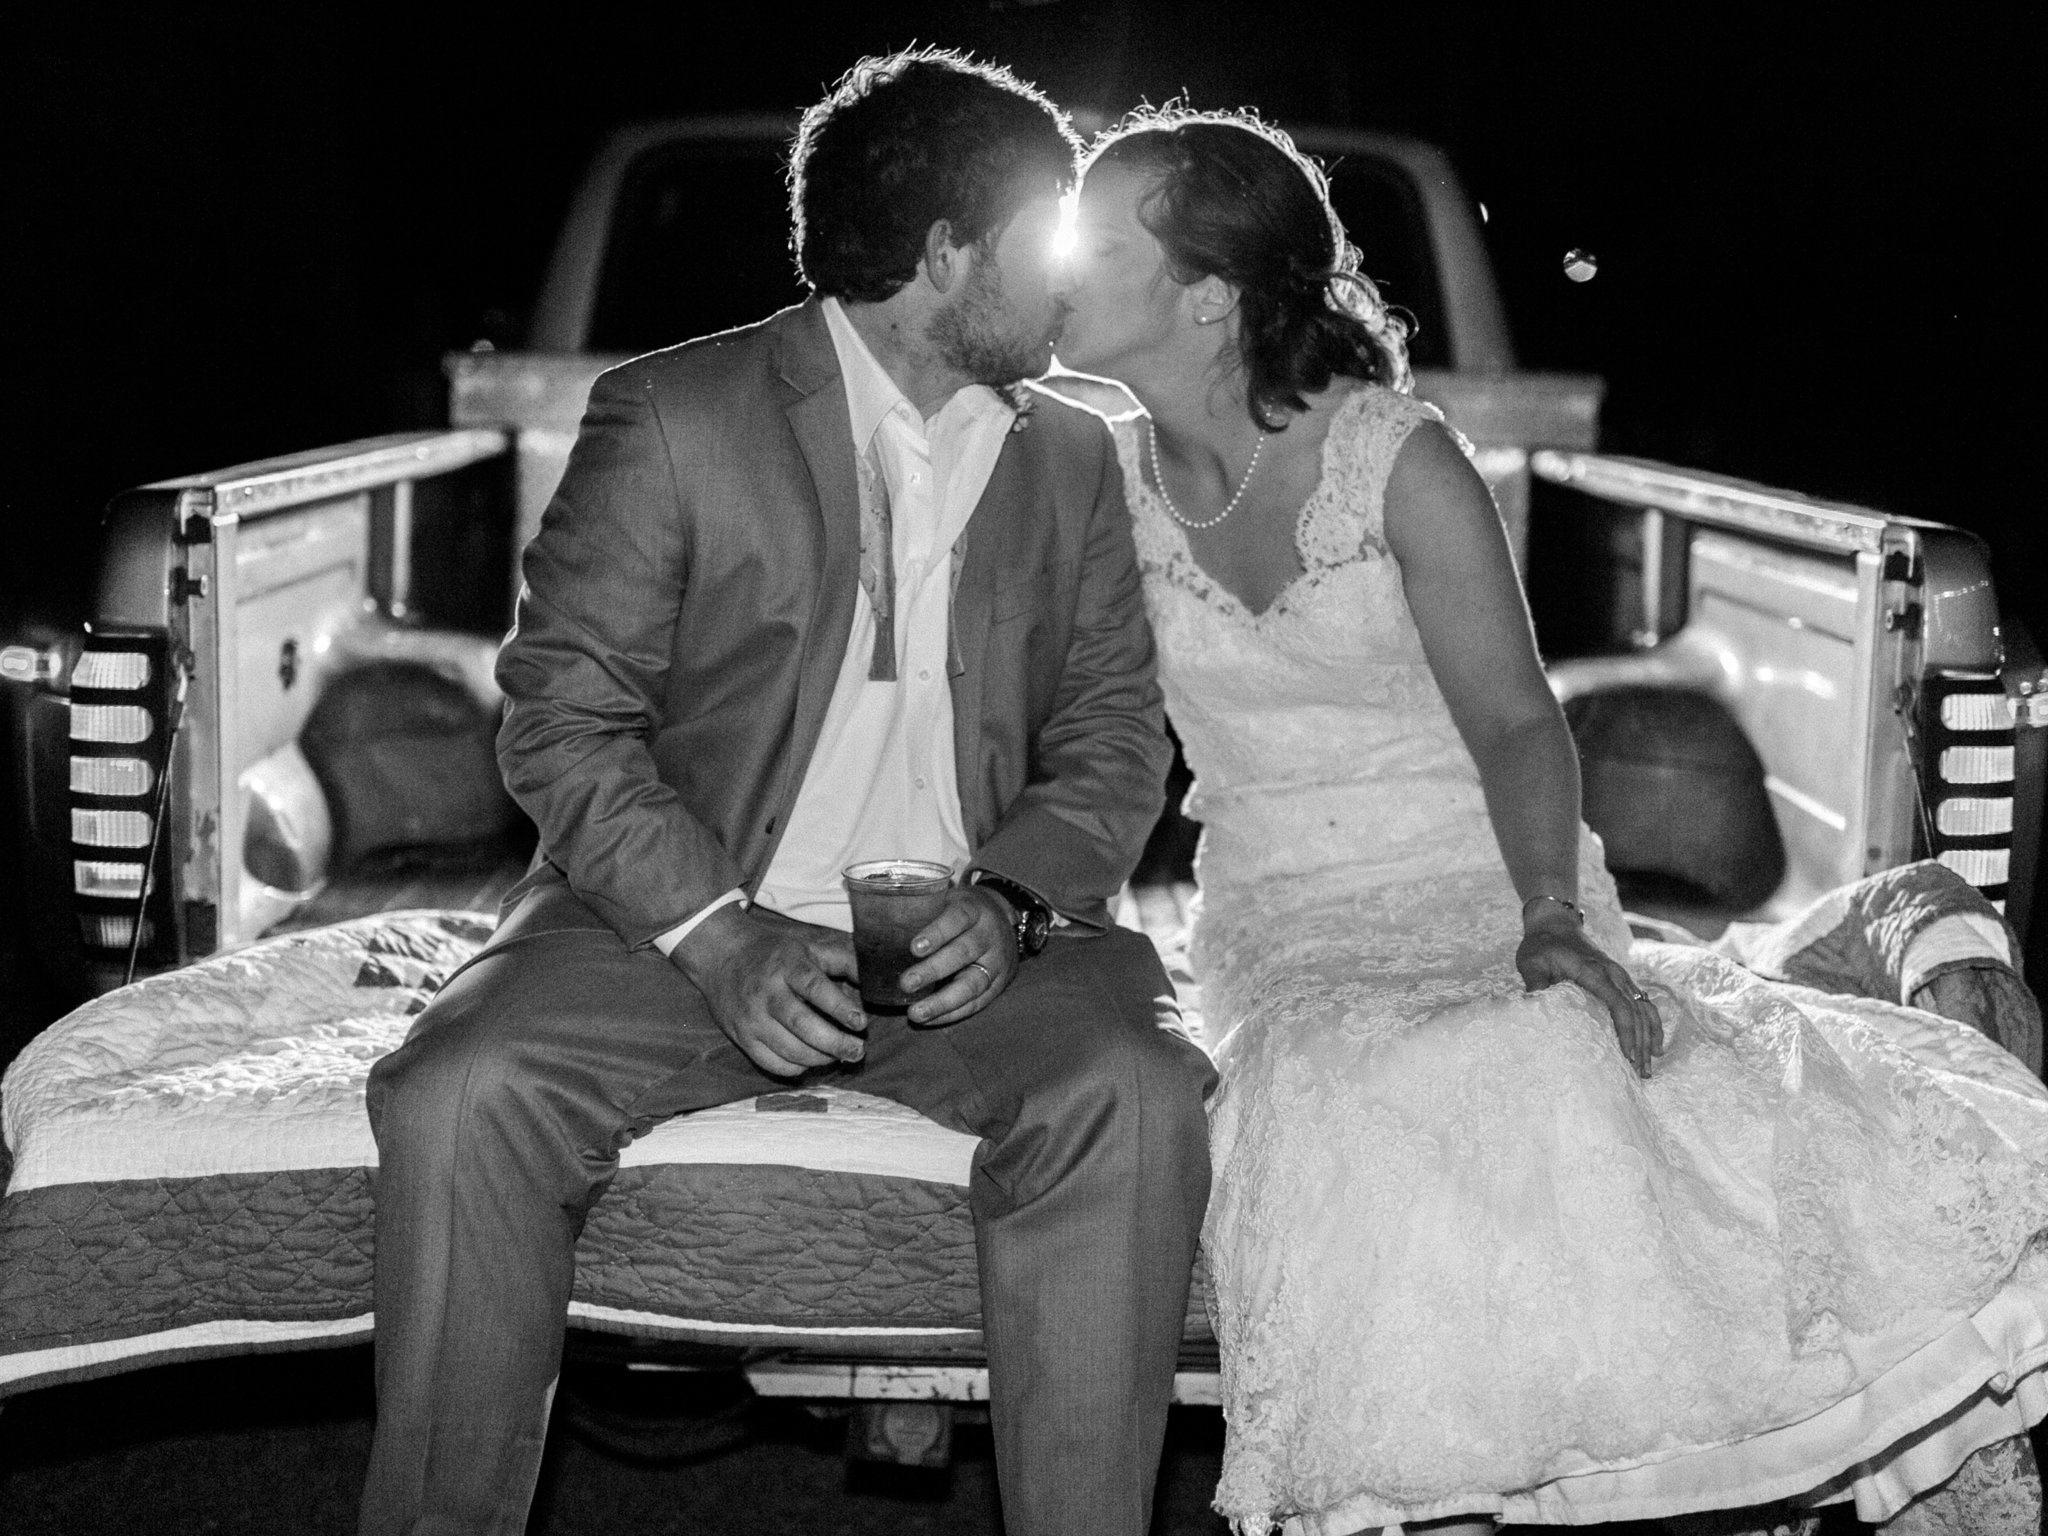 ecila farm wedding albany georgia wedding photographer shannon griffin photography-14.jpg